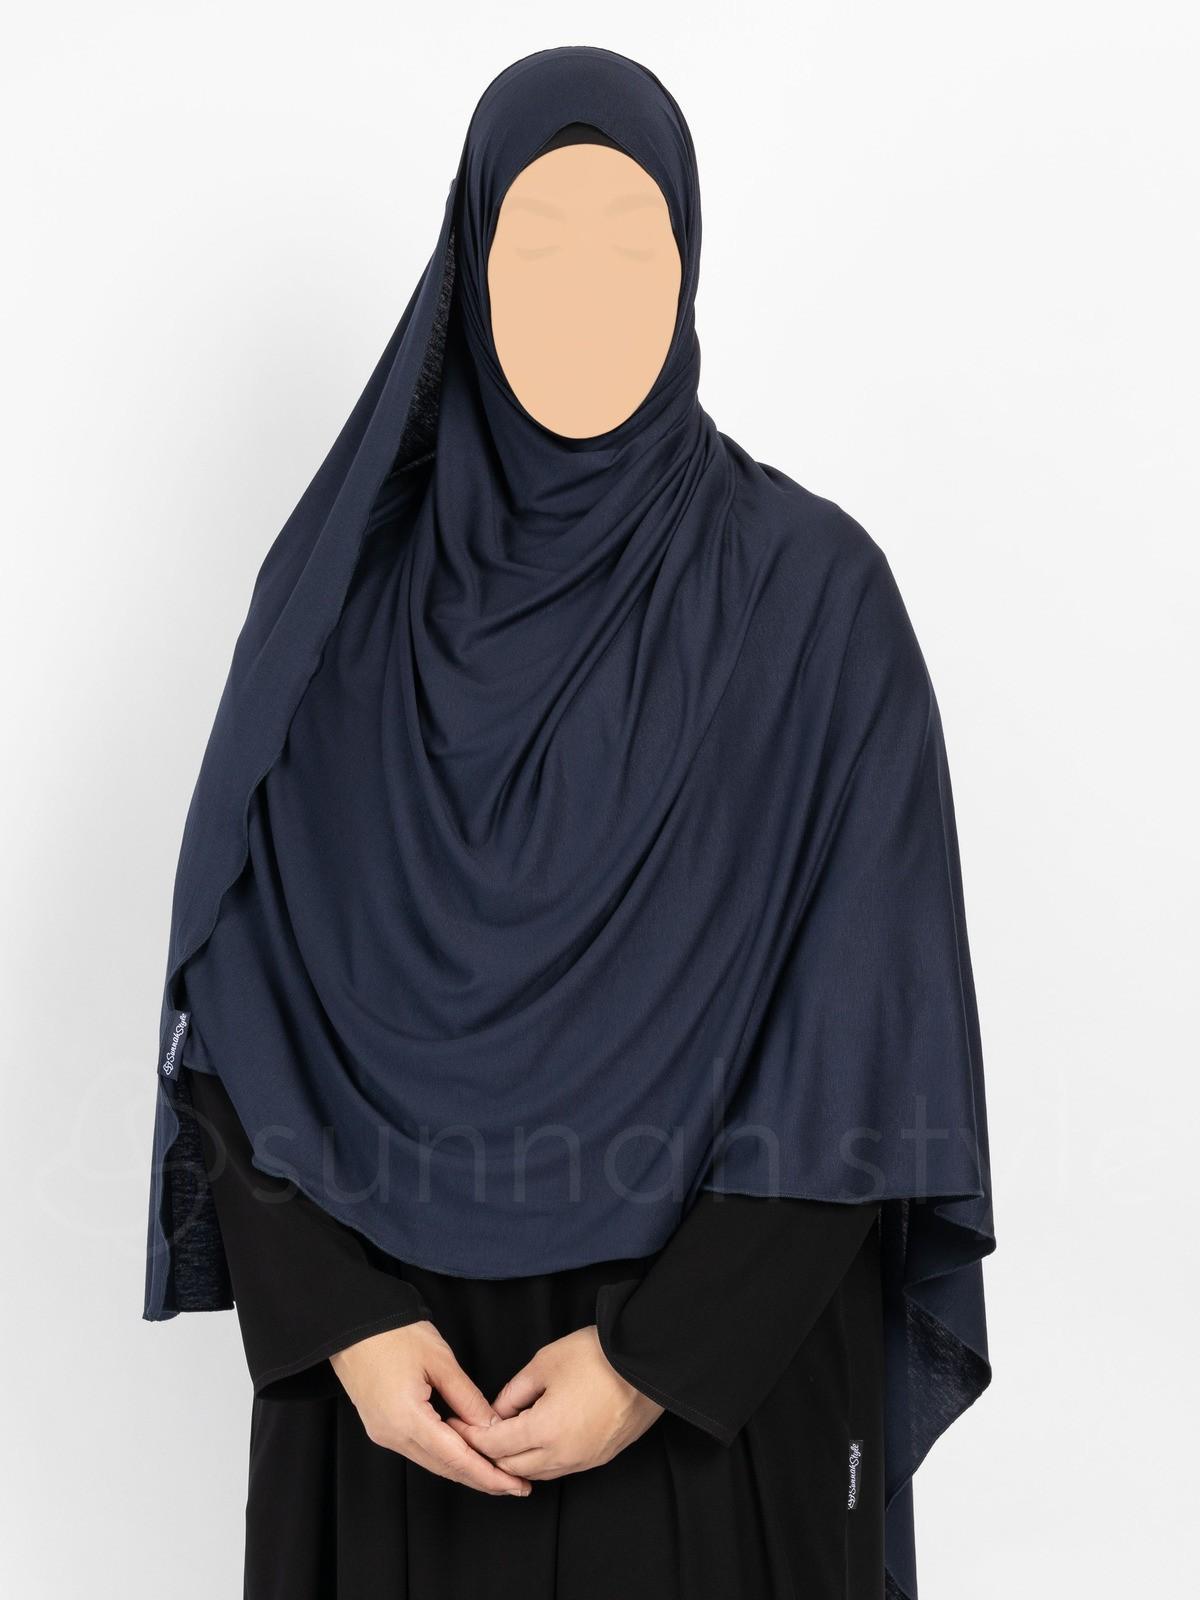 Sunnah Style - Urban Shayla (Soft Jersey) - XL (Navy Blue)